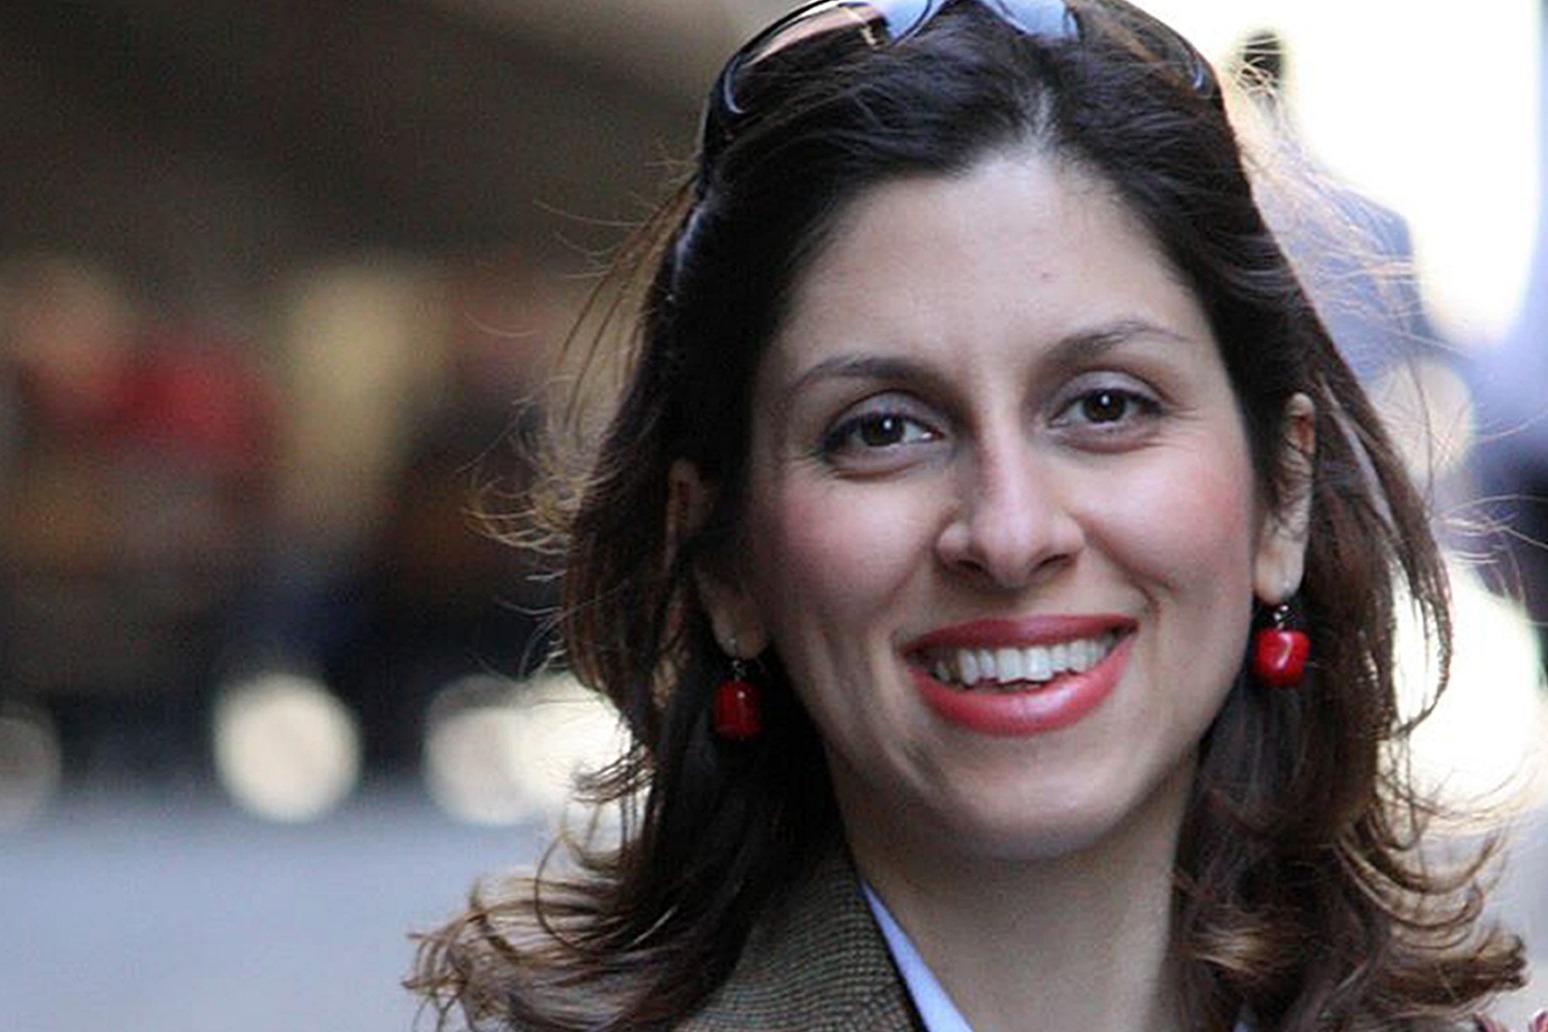 Nazanin Zaghari Ratcliffe to be released as part of Iran prisoner exchange thumbnail